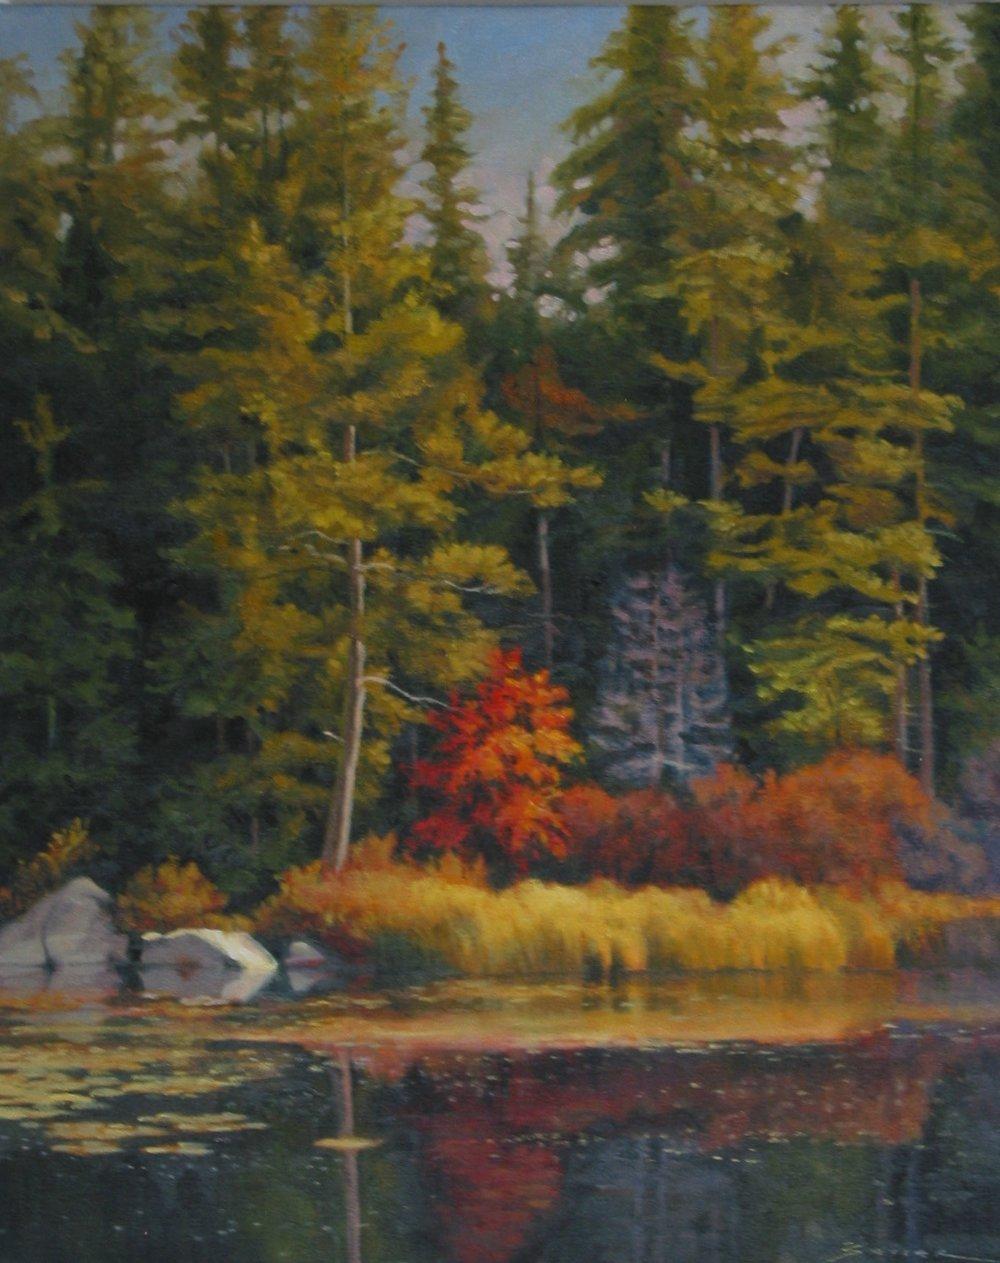 Algonquin Shore, 20 x 16, oil